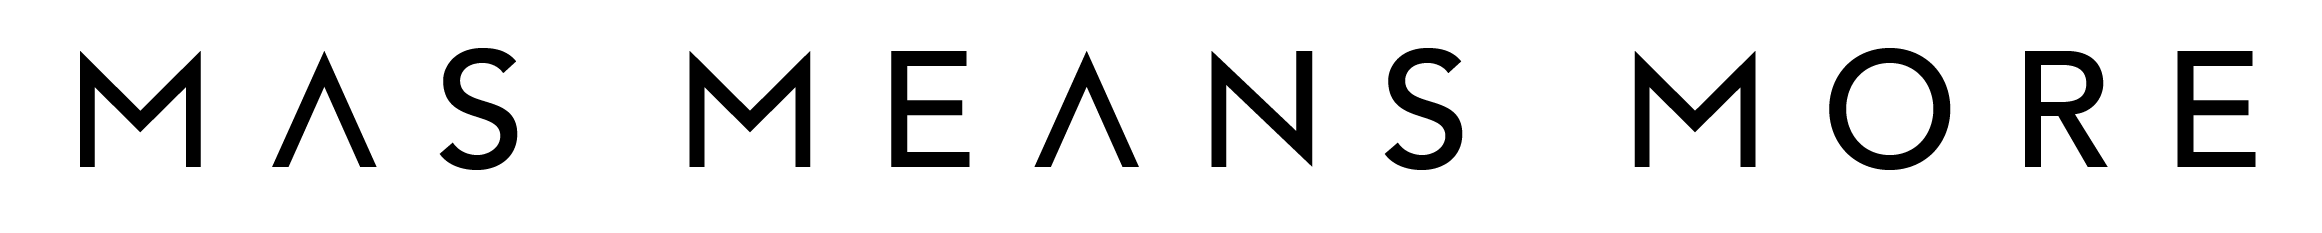 mmminteriors_logo2.png